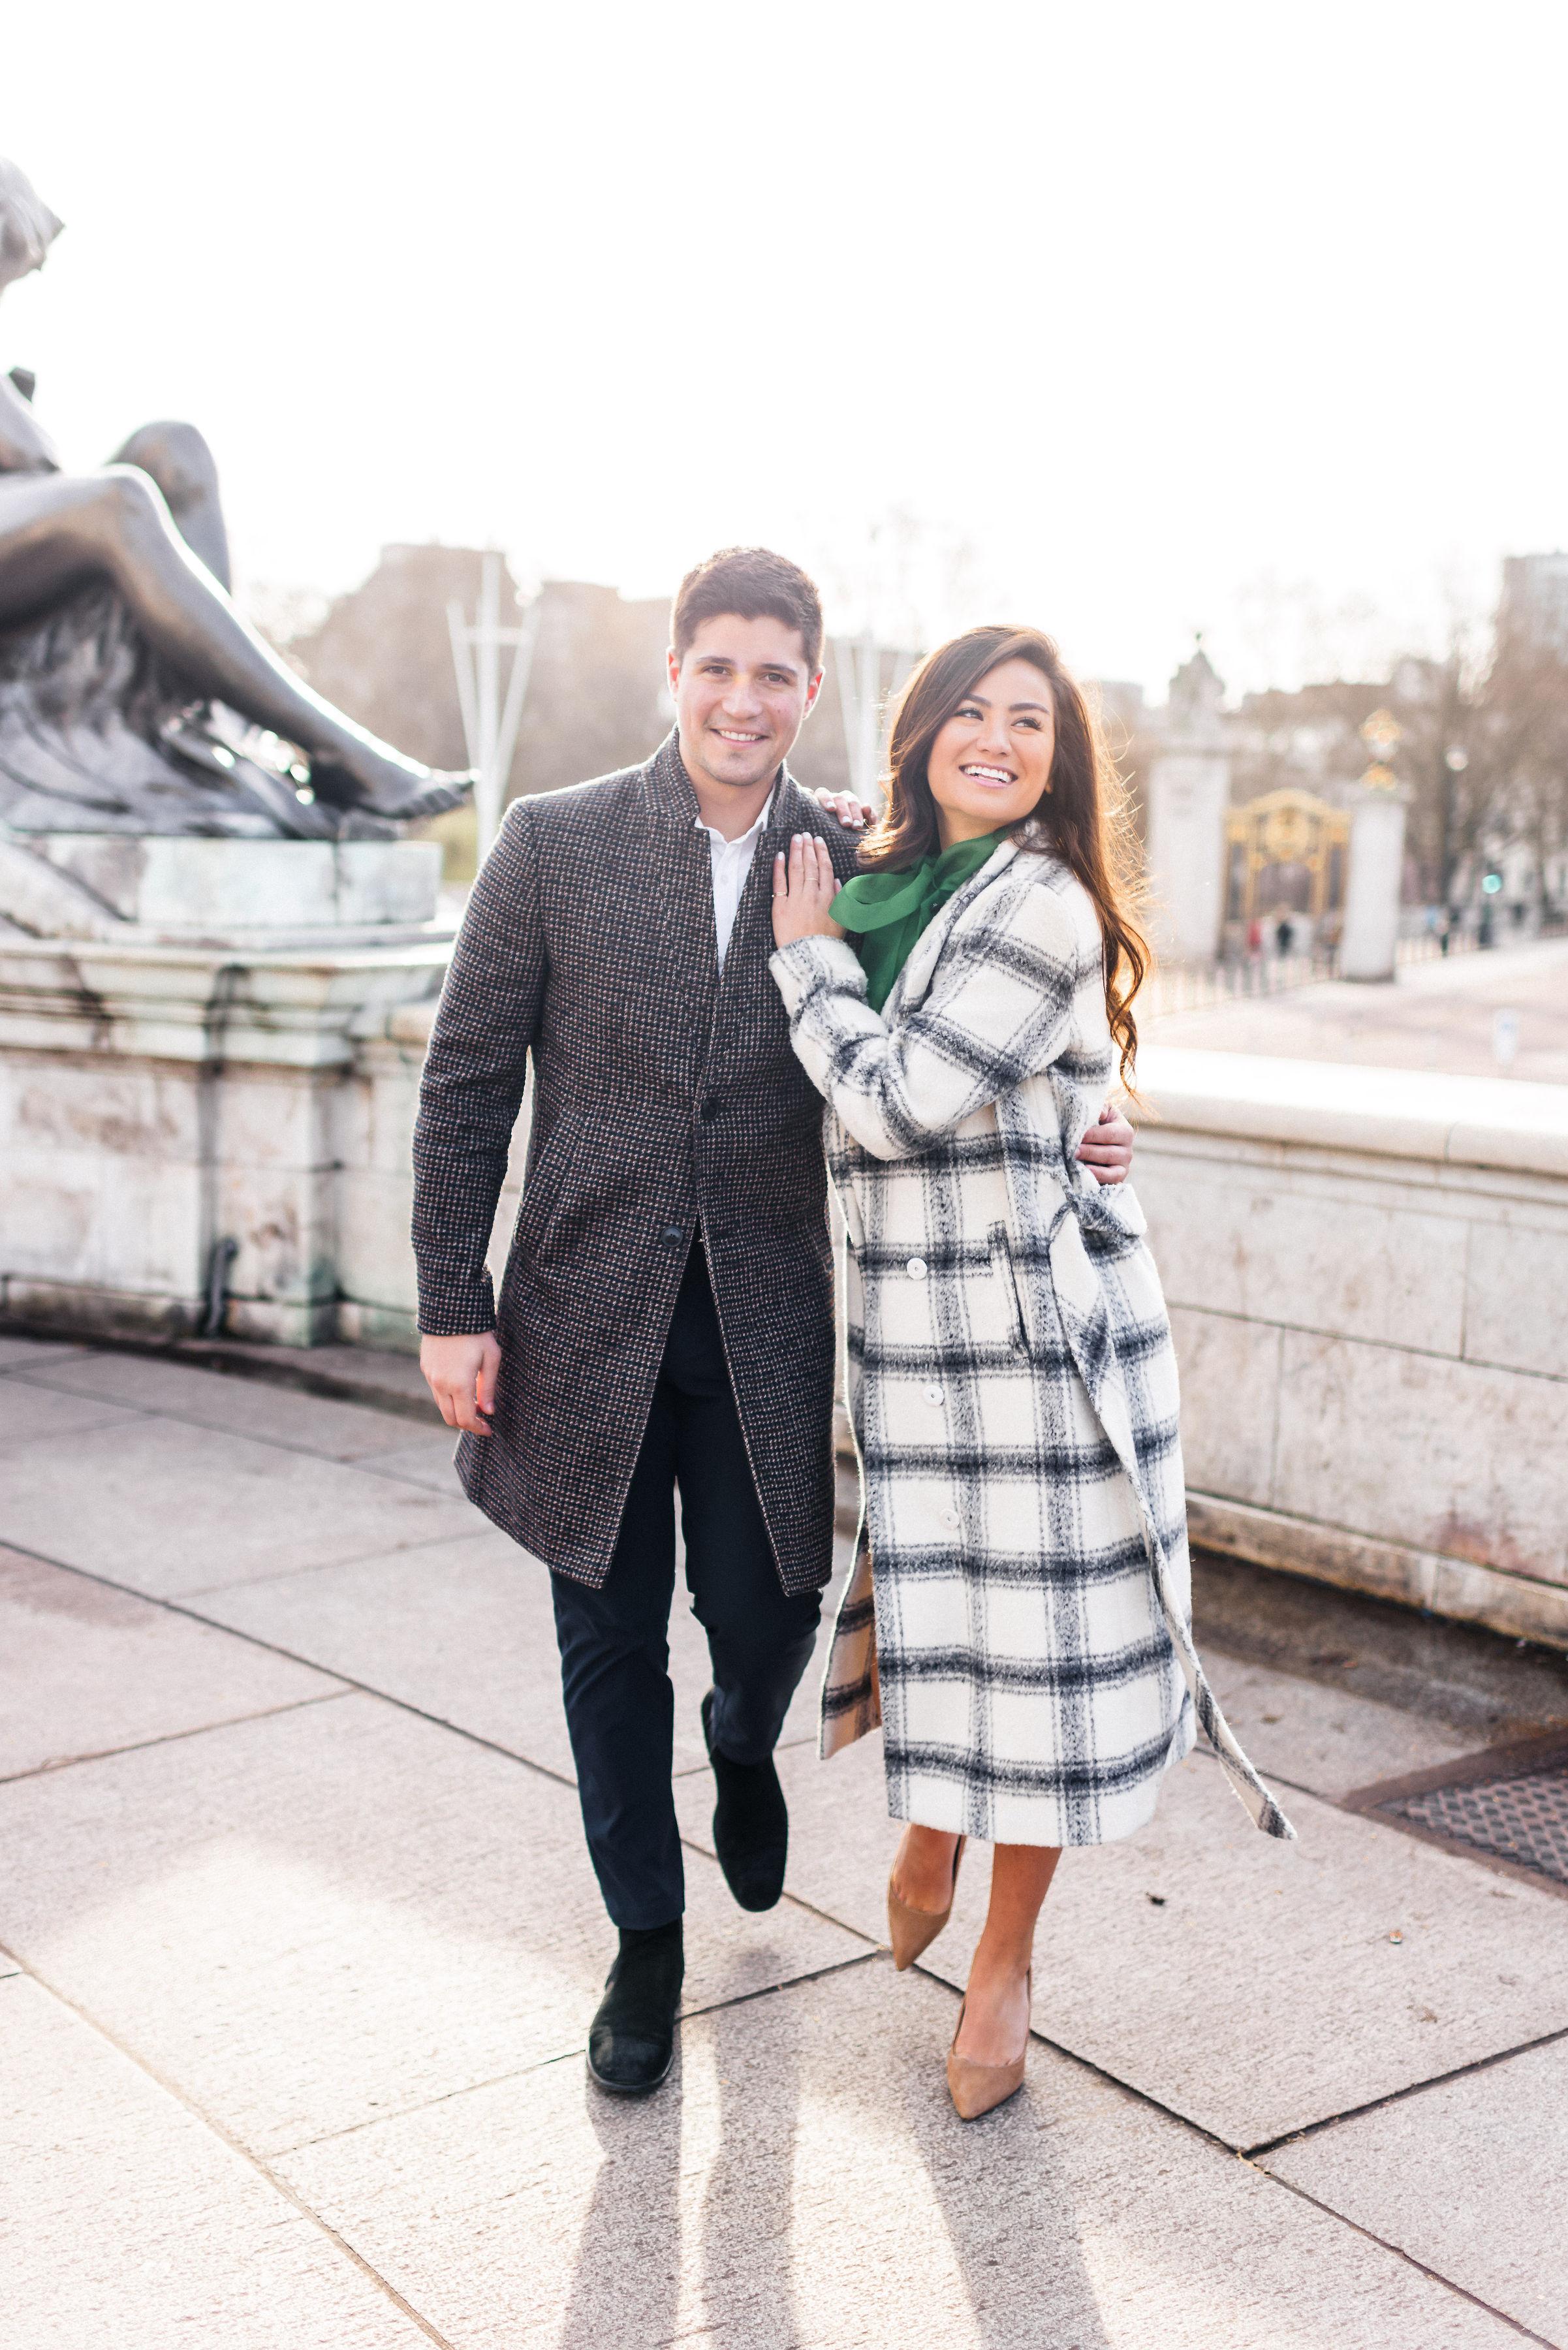 Nick Burrello and Caila Quinn The Bachelor Couple